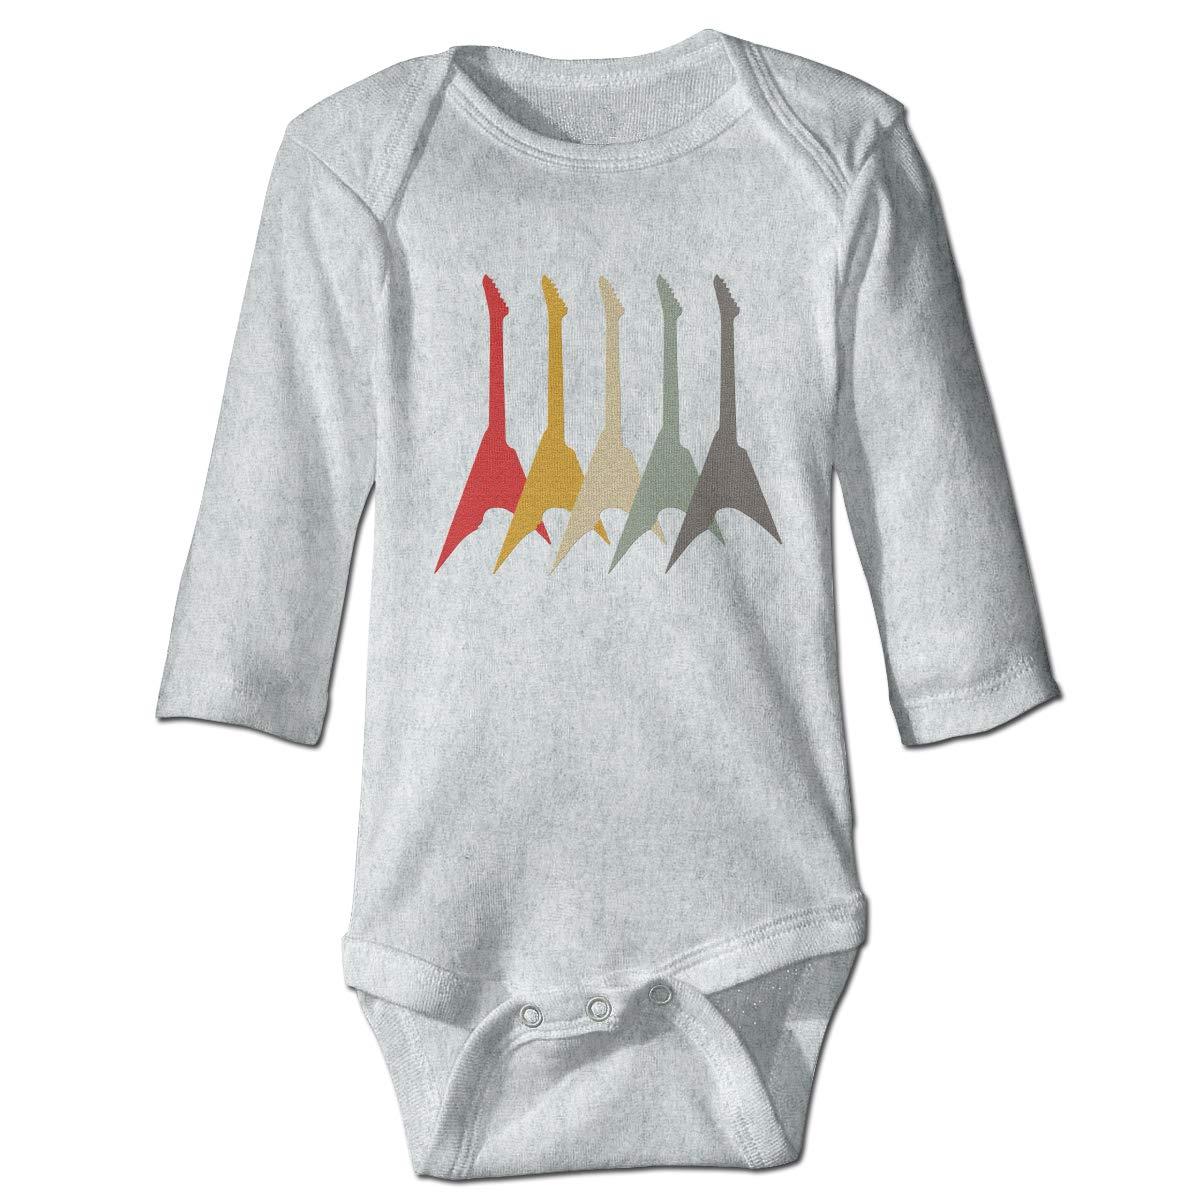 Vintage Electric Guitar Retro Newborn Baby Long Sleeve Bodysuit Romper Infant Summer Clothing